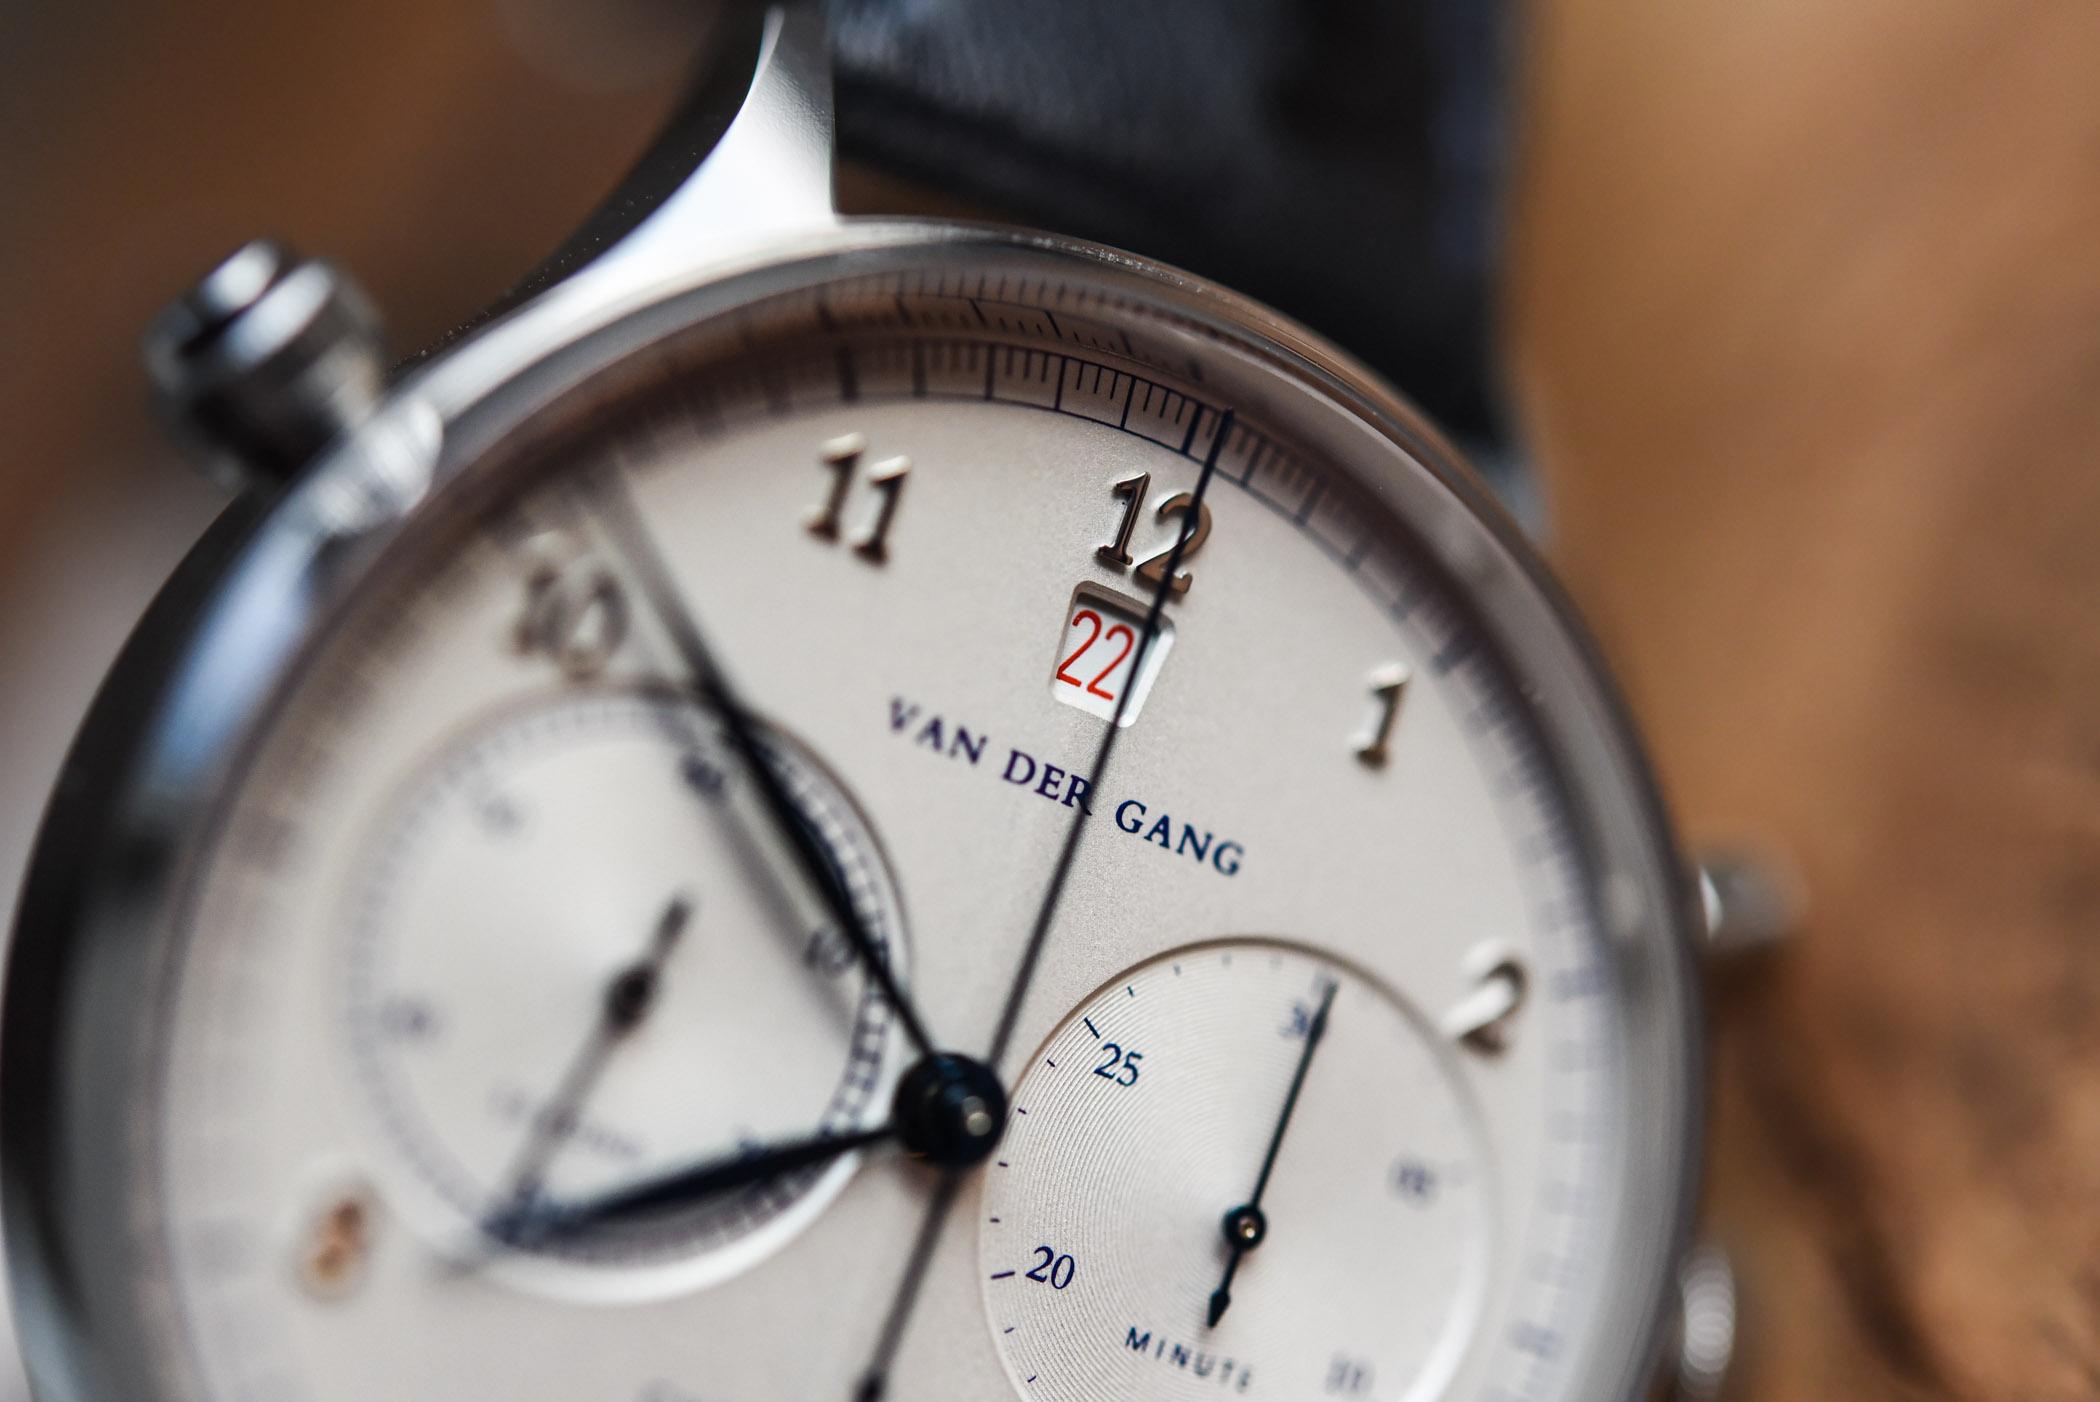 Van der Gang 20019 Chronograph - review - 15